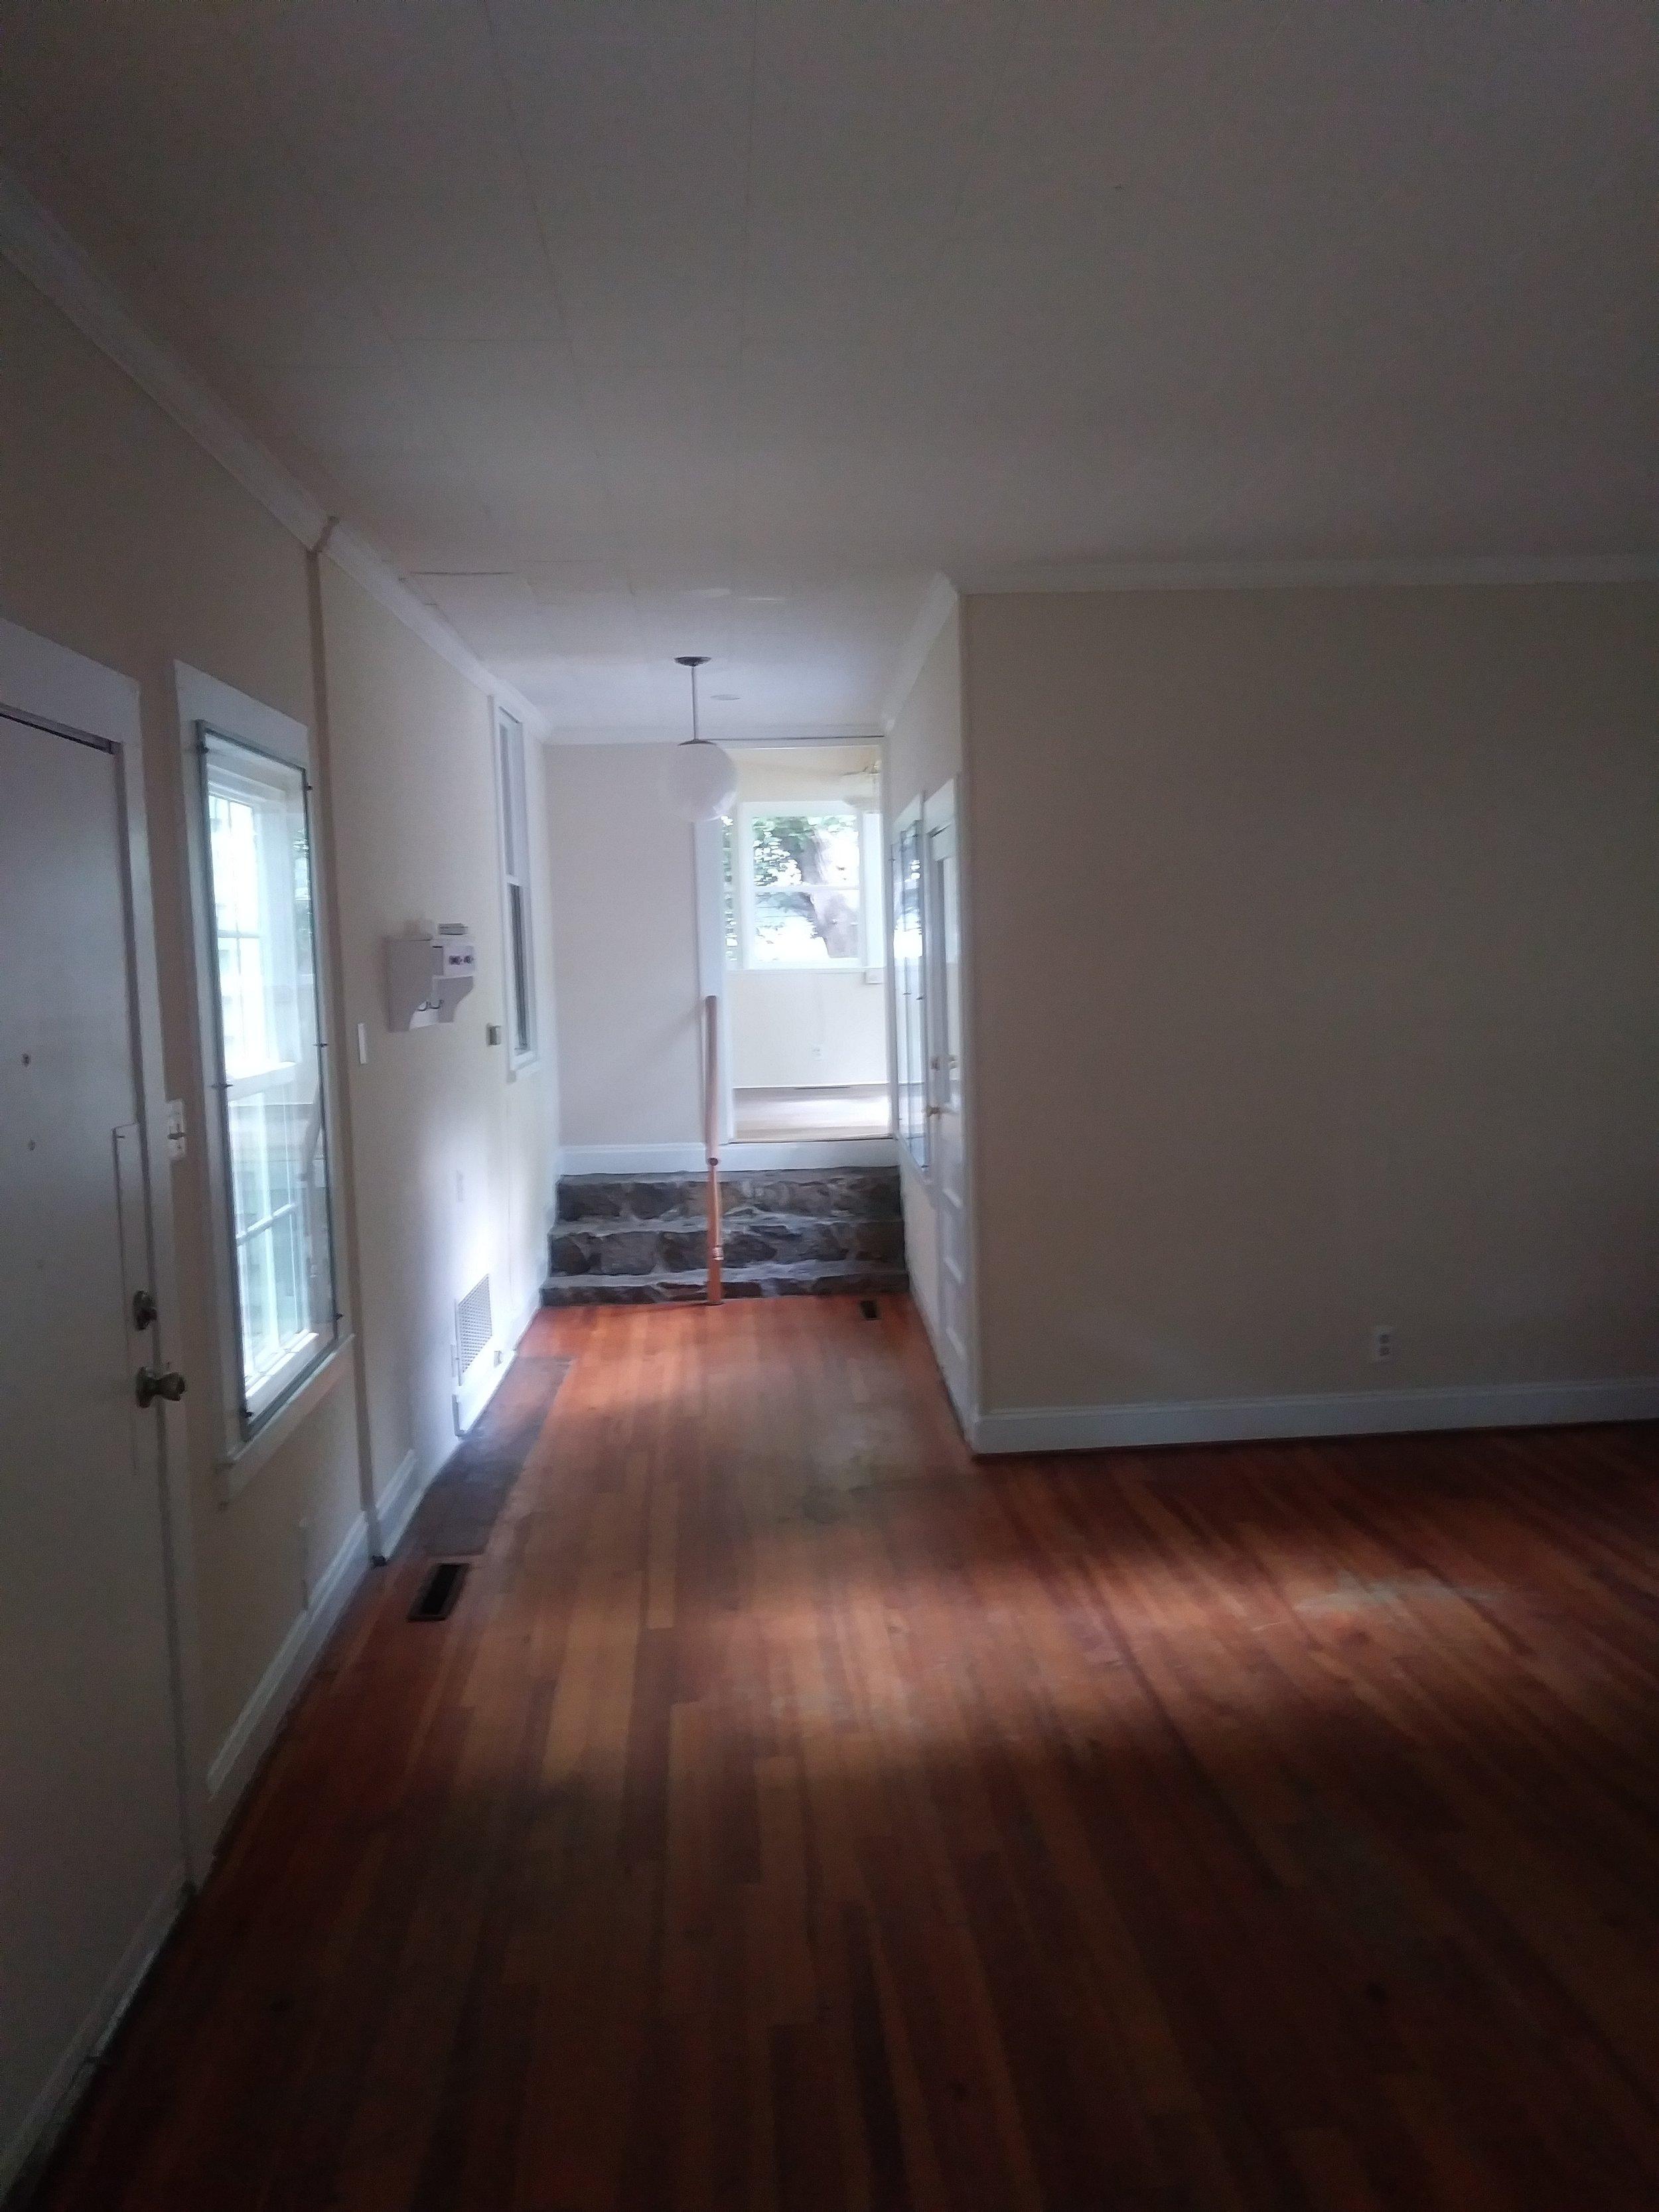 Cottage Lane, 204 - Living Room looking toward DR.jpg